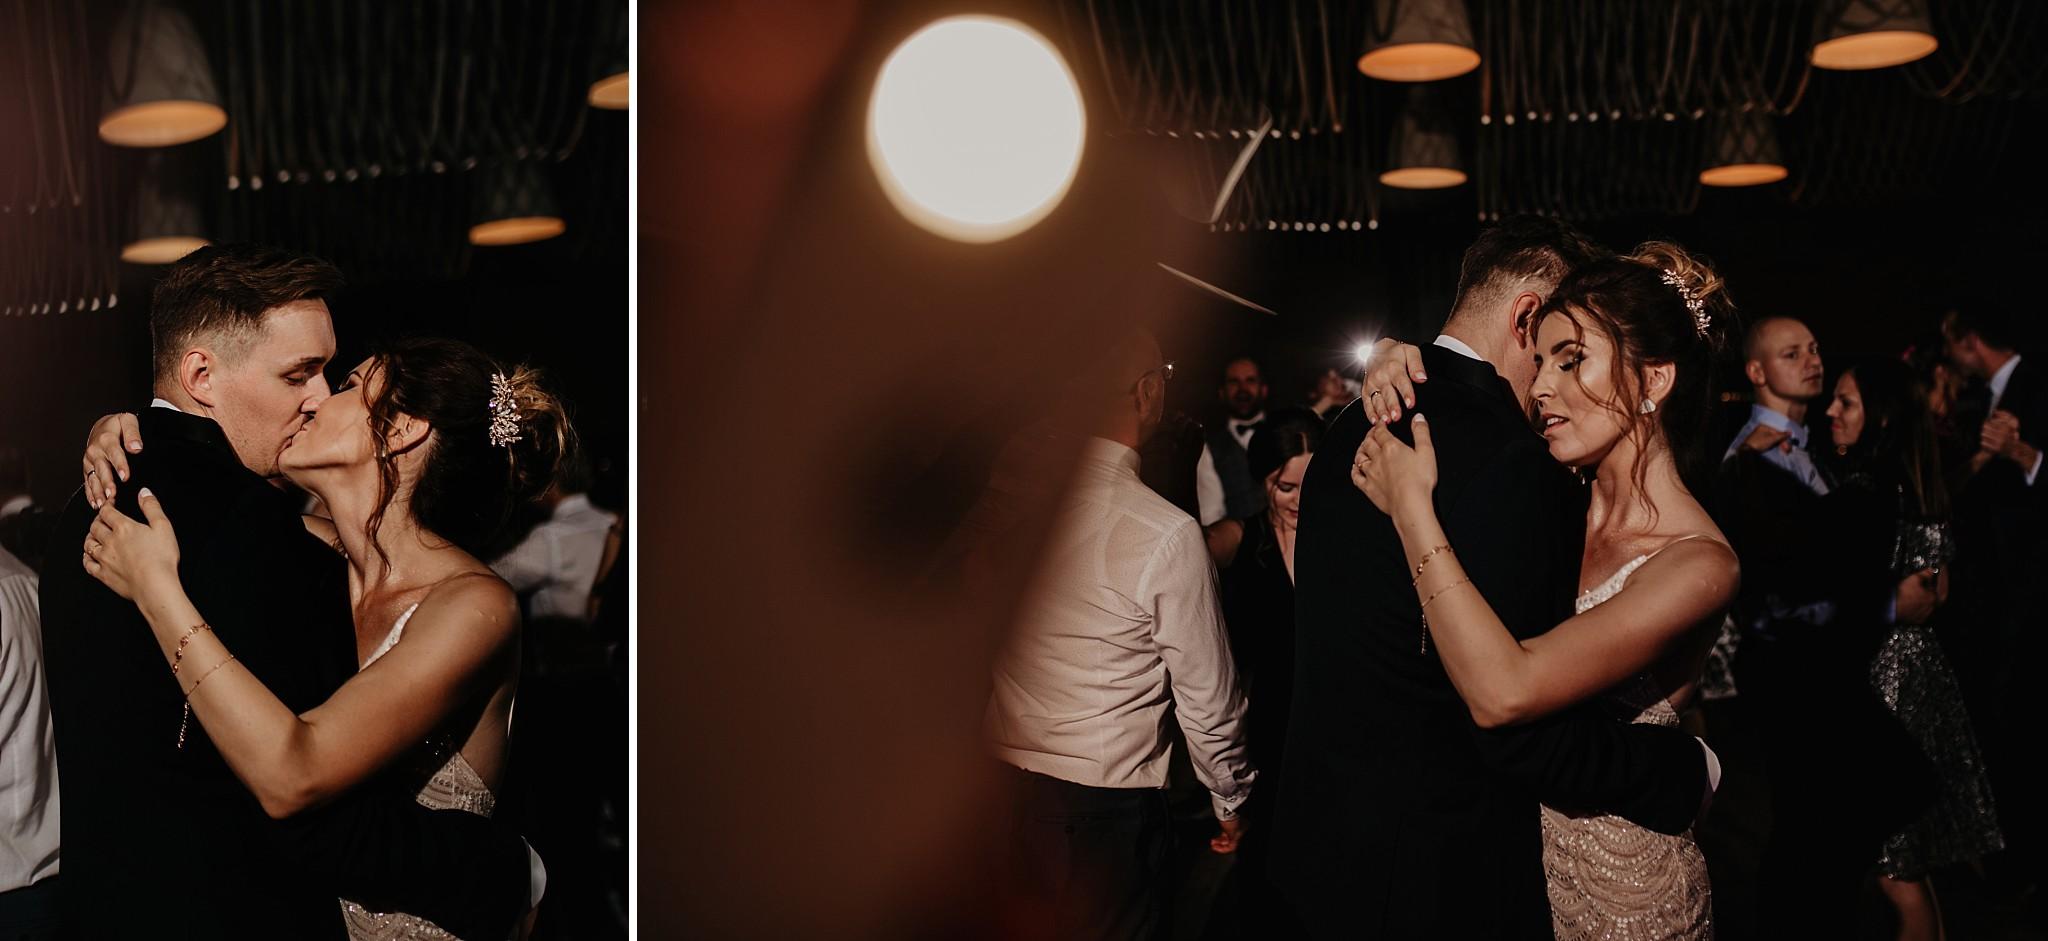 fotograf poznan wesele dobra truskawka piekne wesele pod poznaniem wesele w dobrej truskawce piekna para mloda slub marzen slub koronawirus slub listopad wesele koronawirus 416